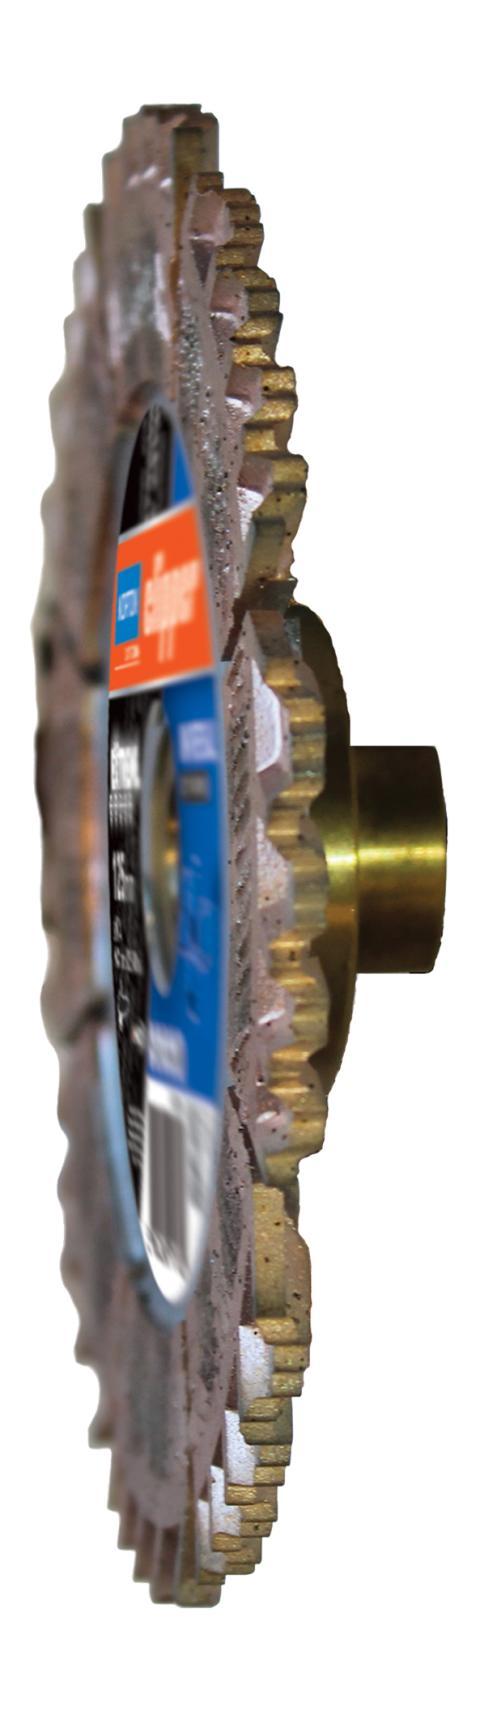 Norton Clipper klinga Extreme Cut&Grind - Produkt 3